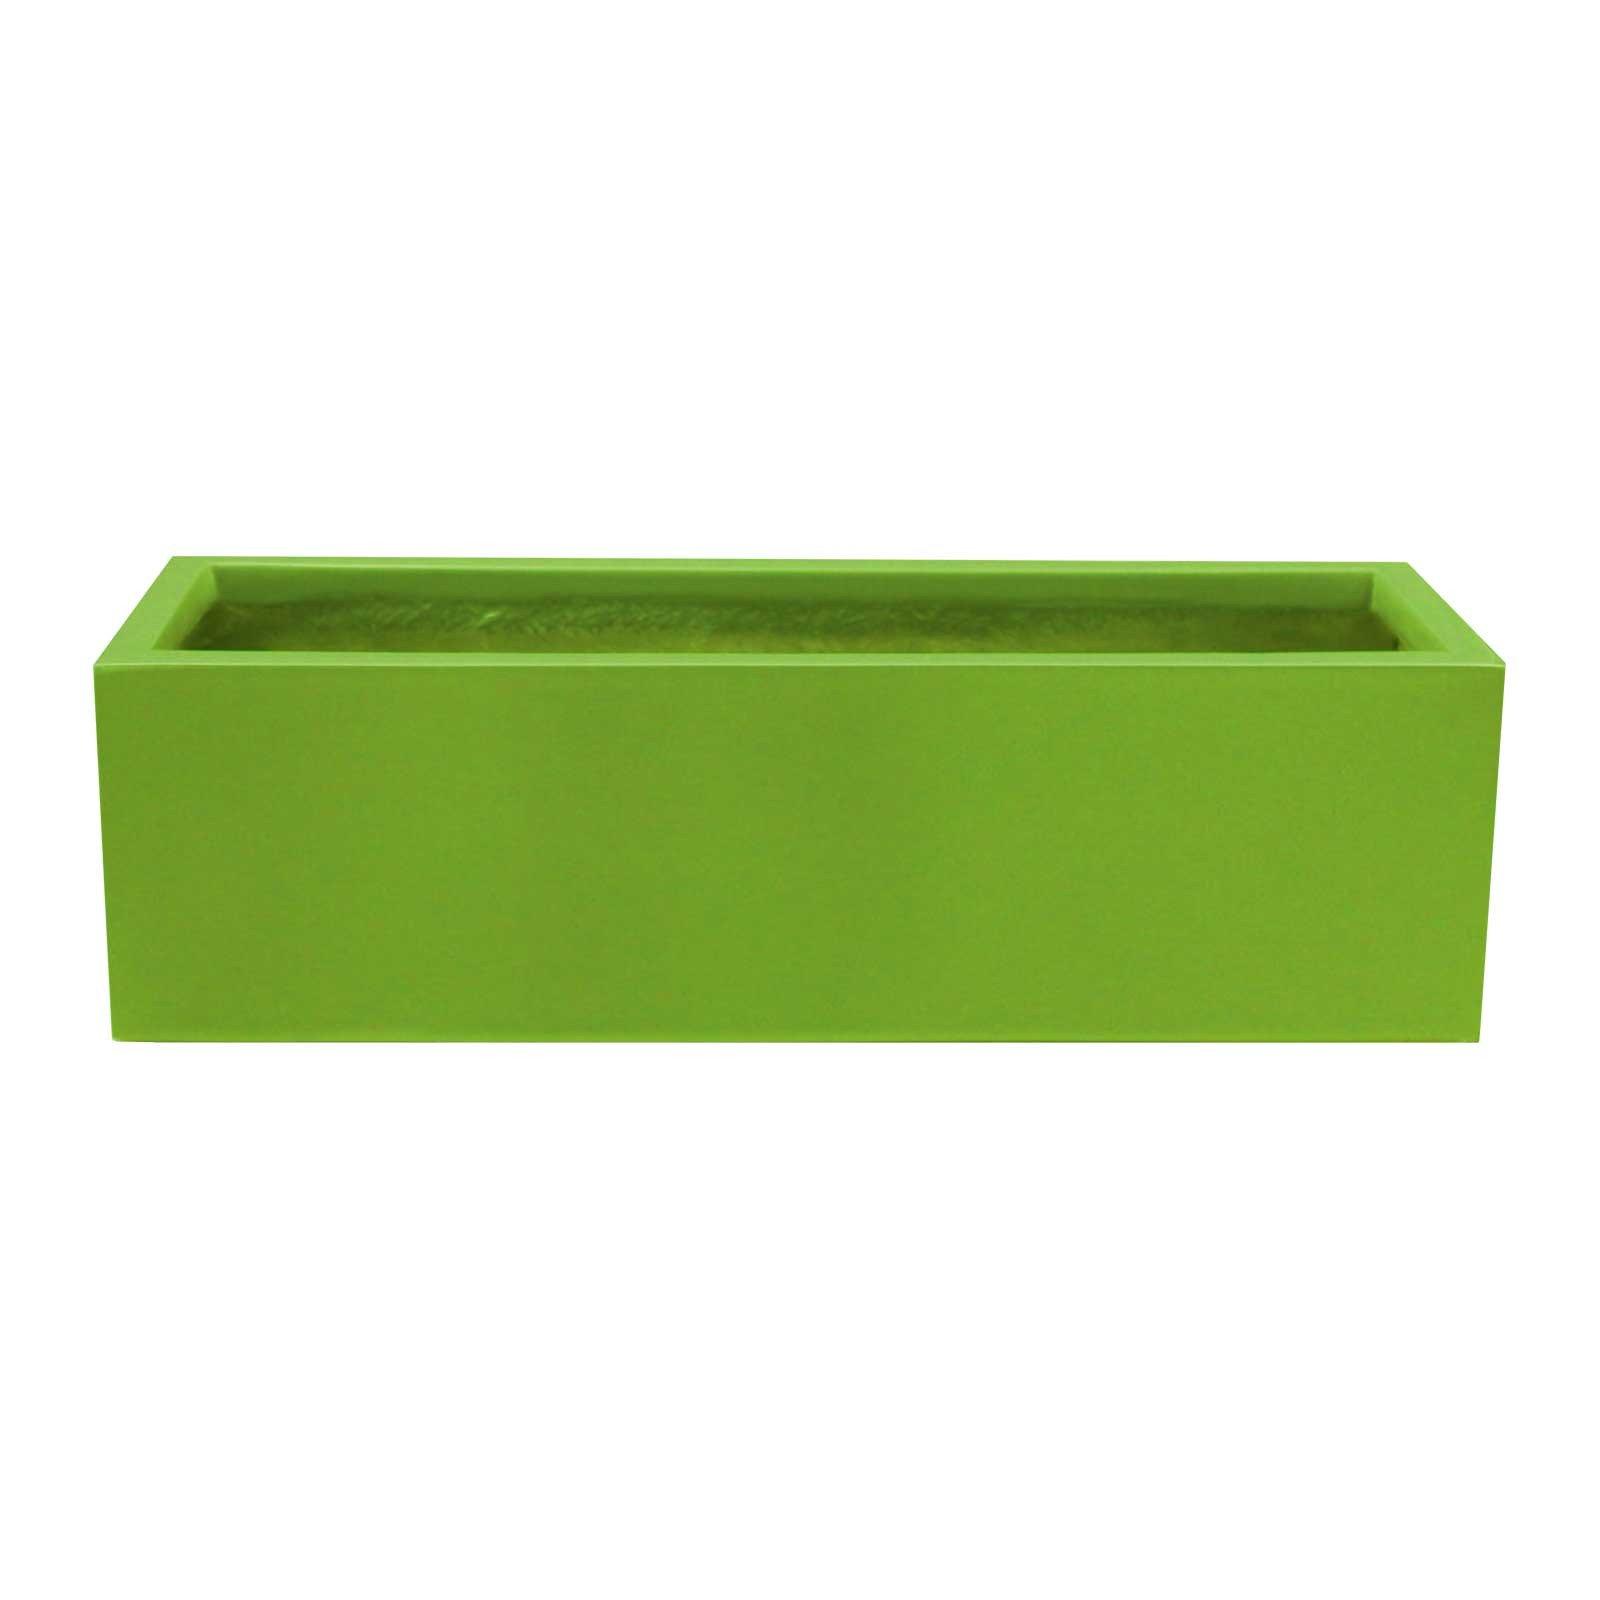 Low Profile Planter Boxes - Fiberglass - 12' Tall, (36'/48' Length; 14'/24' Width)